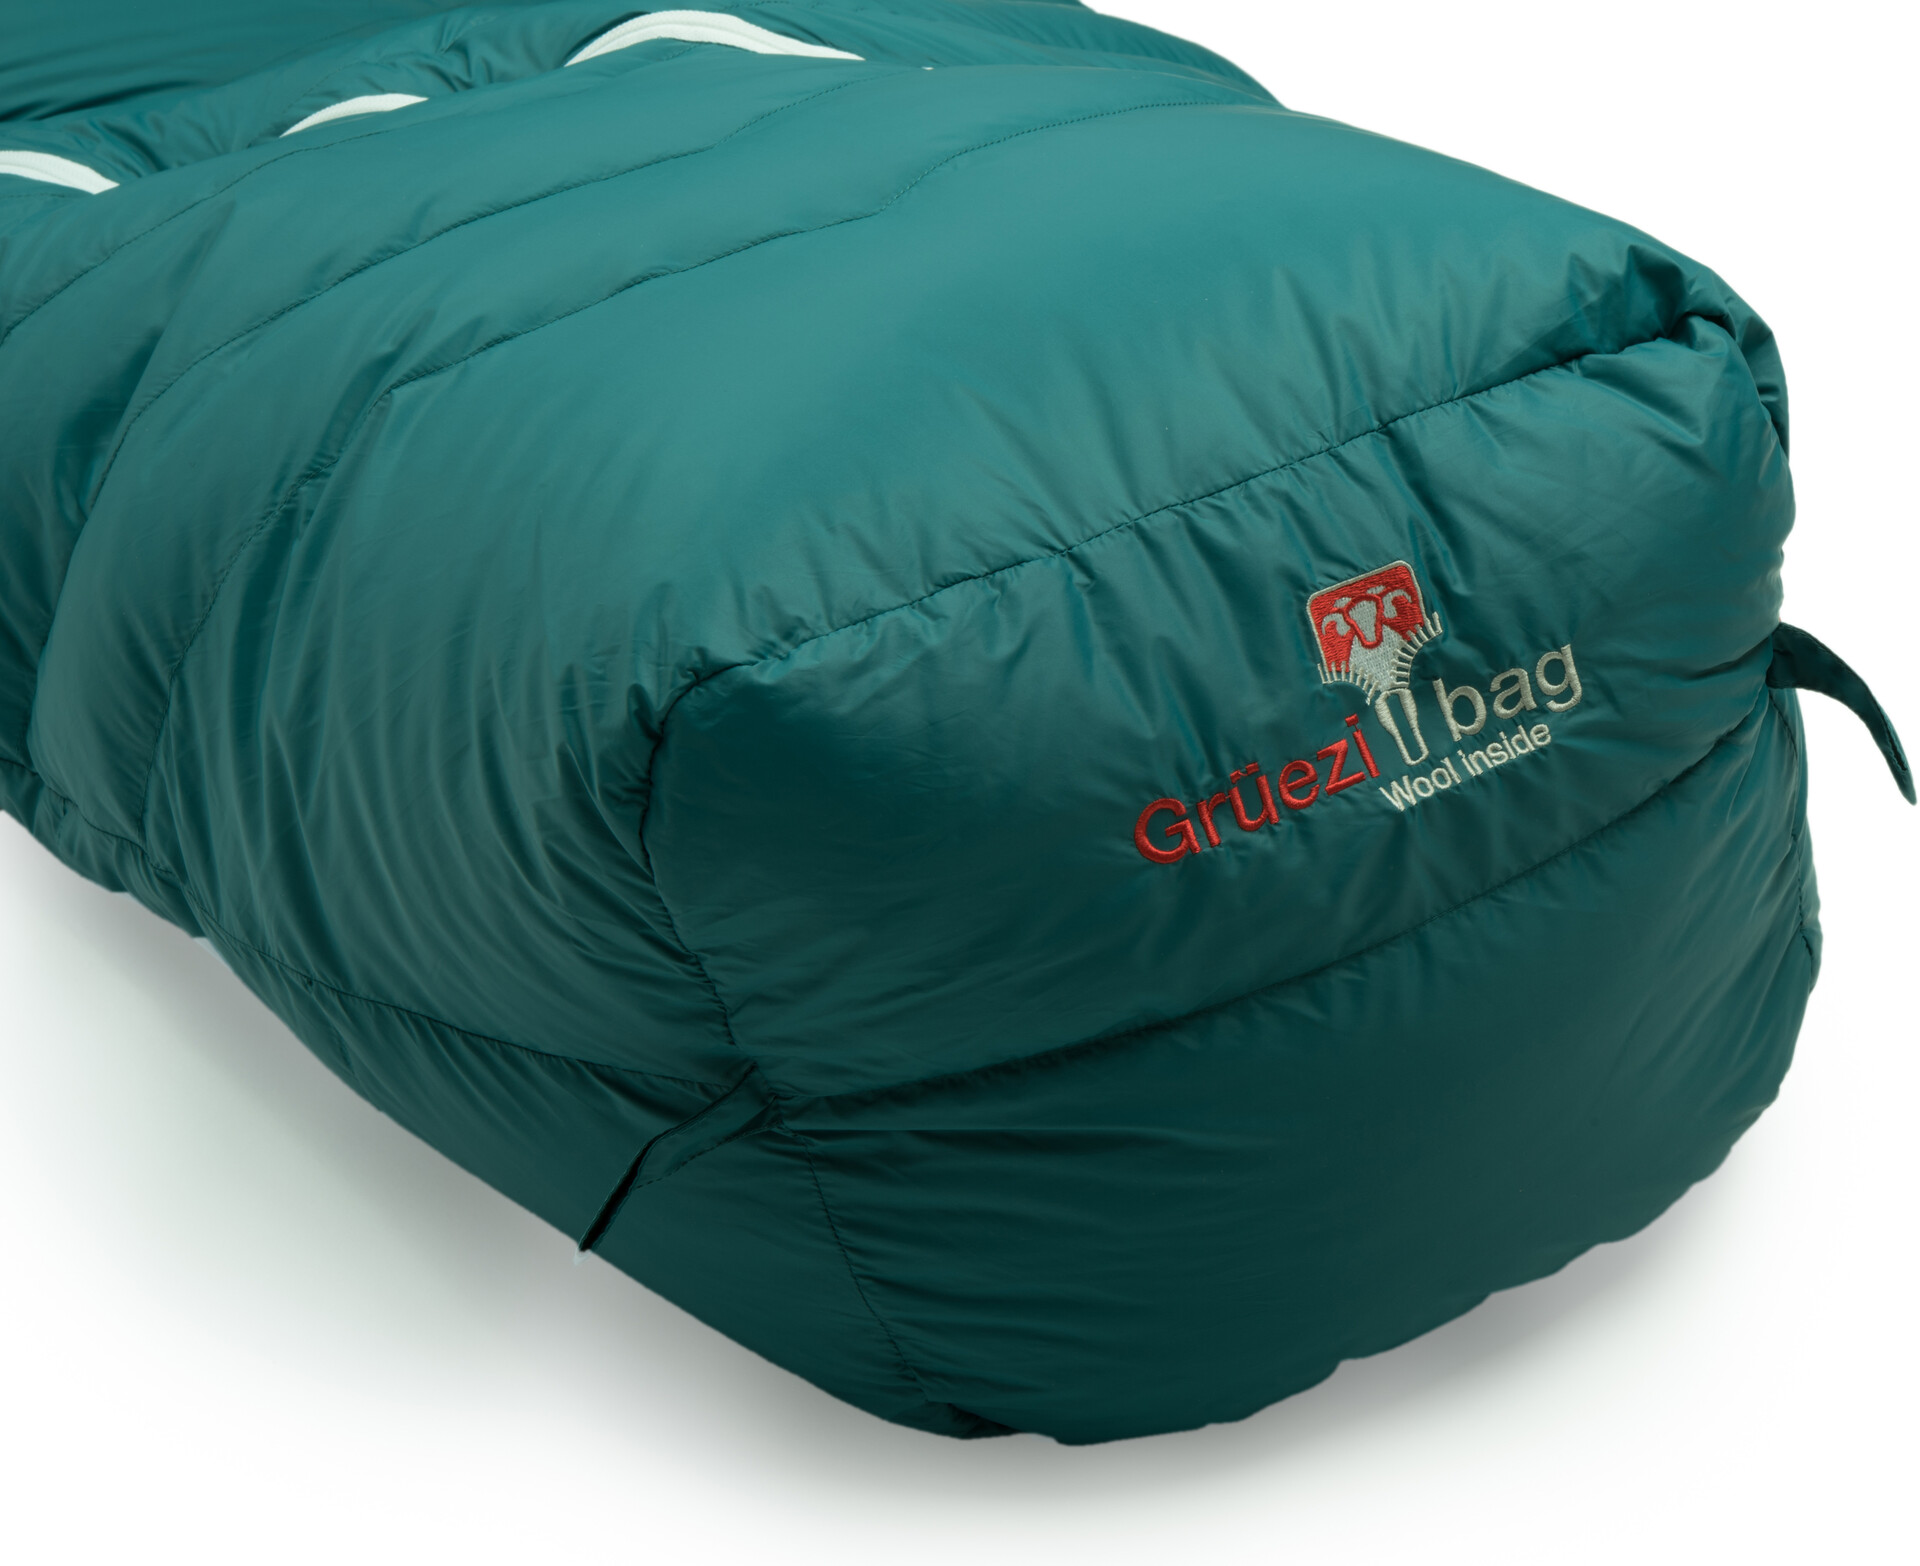 Gr/üezi-Bag Biopod DownWool Extreme Light 175 Sleeping Bag Viridian Green 2019 Schlafsack